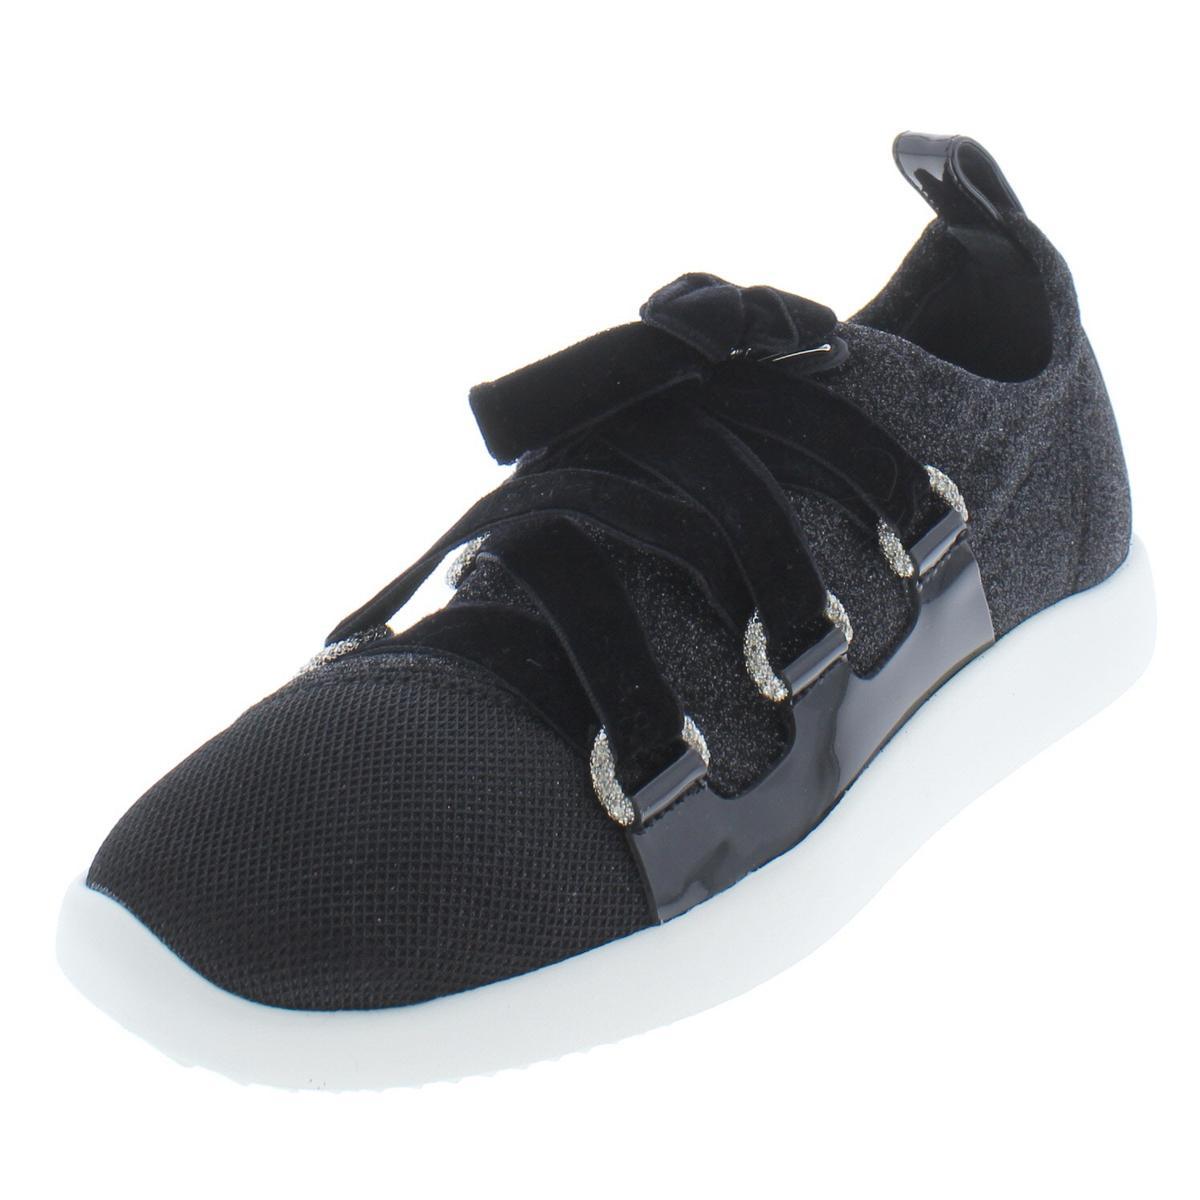 c559d6c364c Details about Giuseppe Zanotti Womens Singleg SC Donna Patent Fashion  Sneakers Shoes BHFO 8456